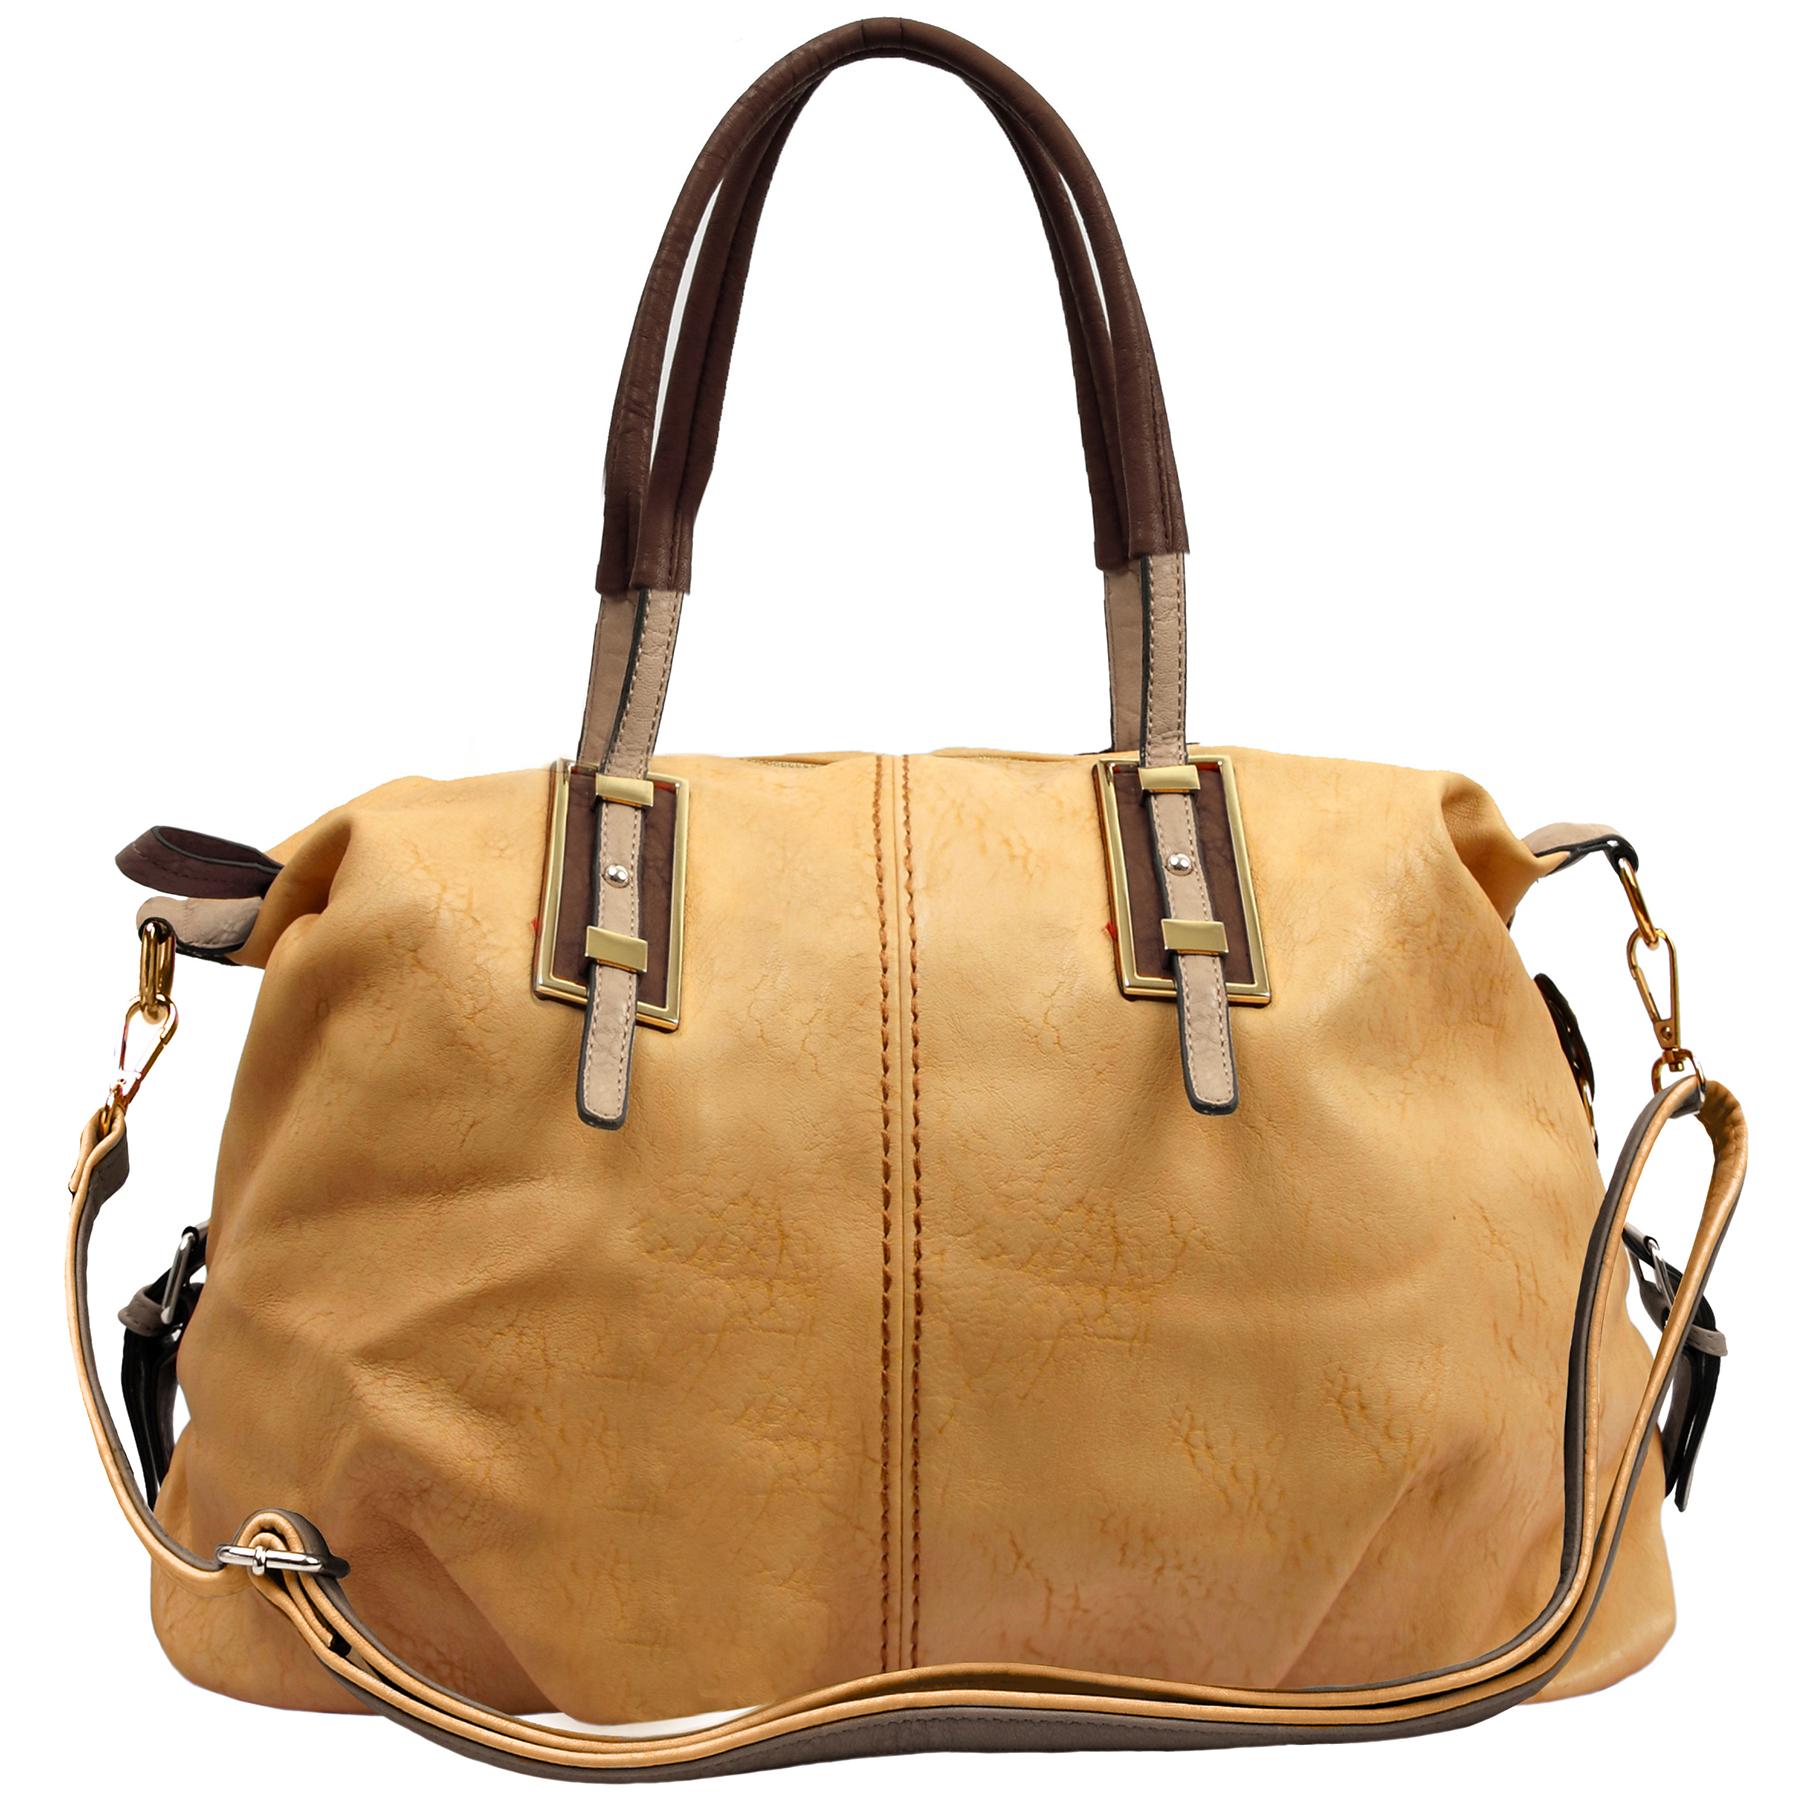 ACACIA Caramel Large Everyday Shopper Hobo Handbag Front